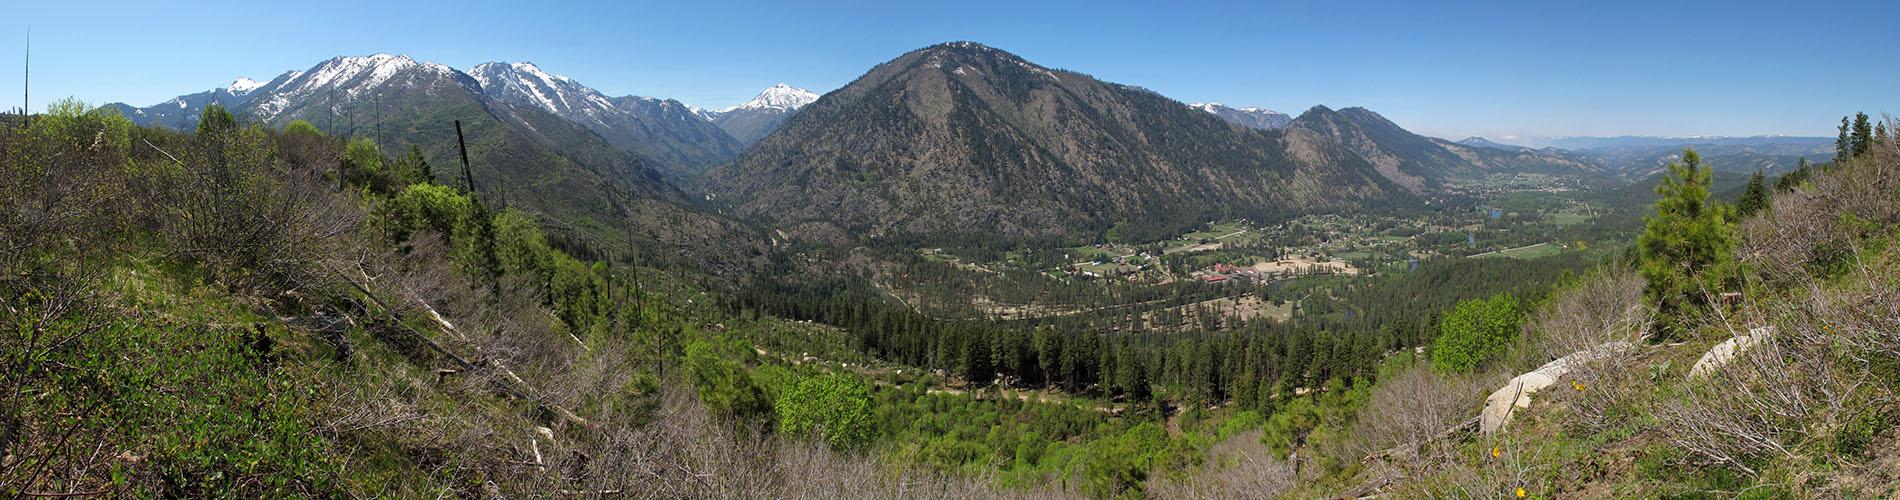 Mountain Home Ridge panorama [Rat Creek Ridge Trail, Wenatchee National Forest, Washington]